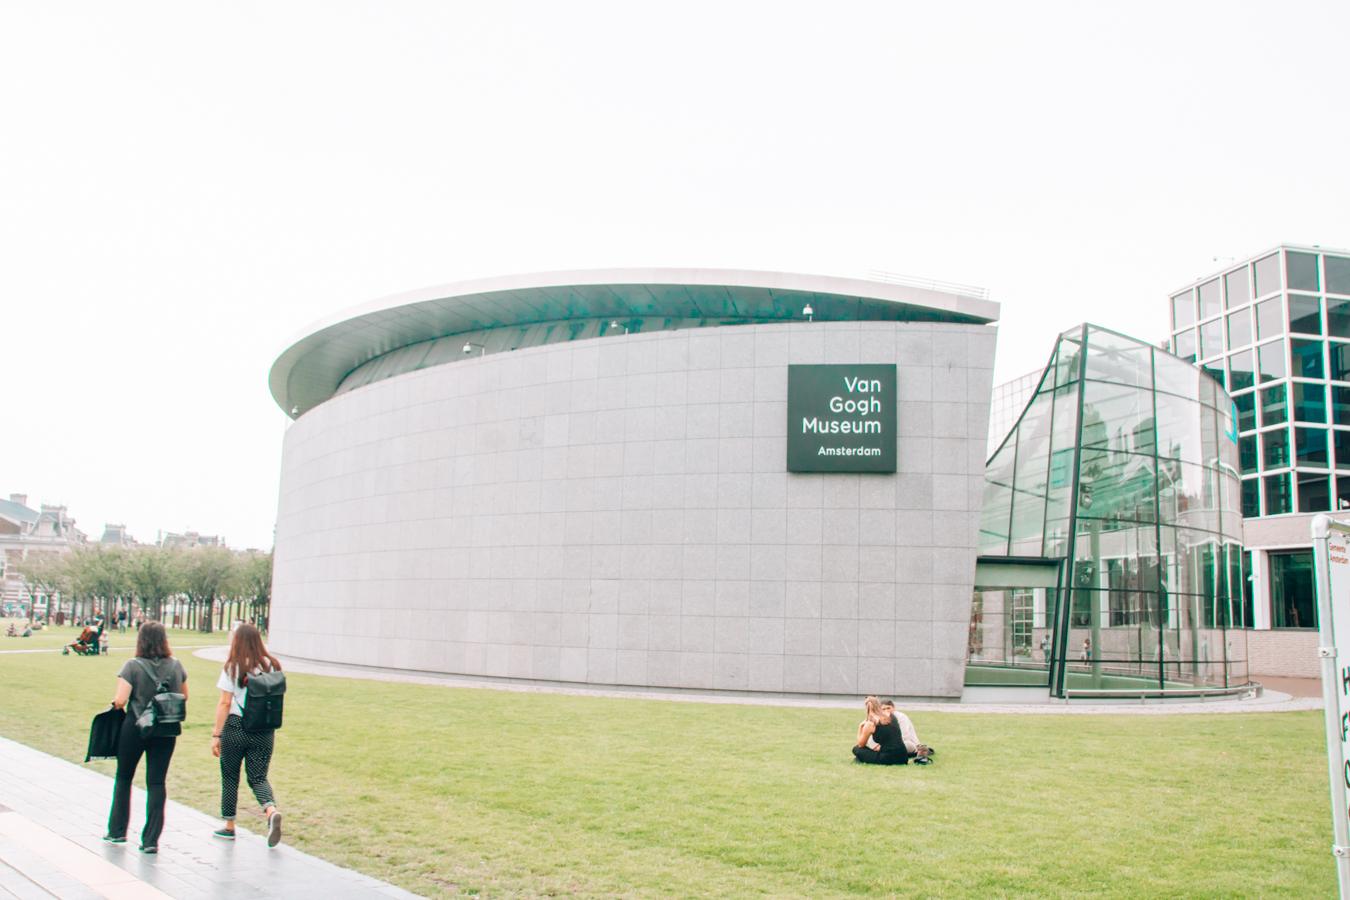 Van Gogh Museum at Museum Square